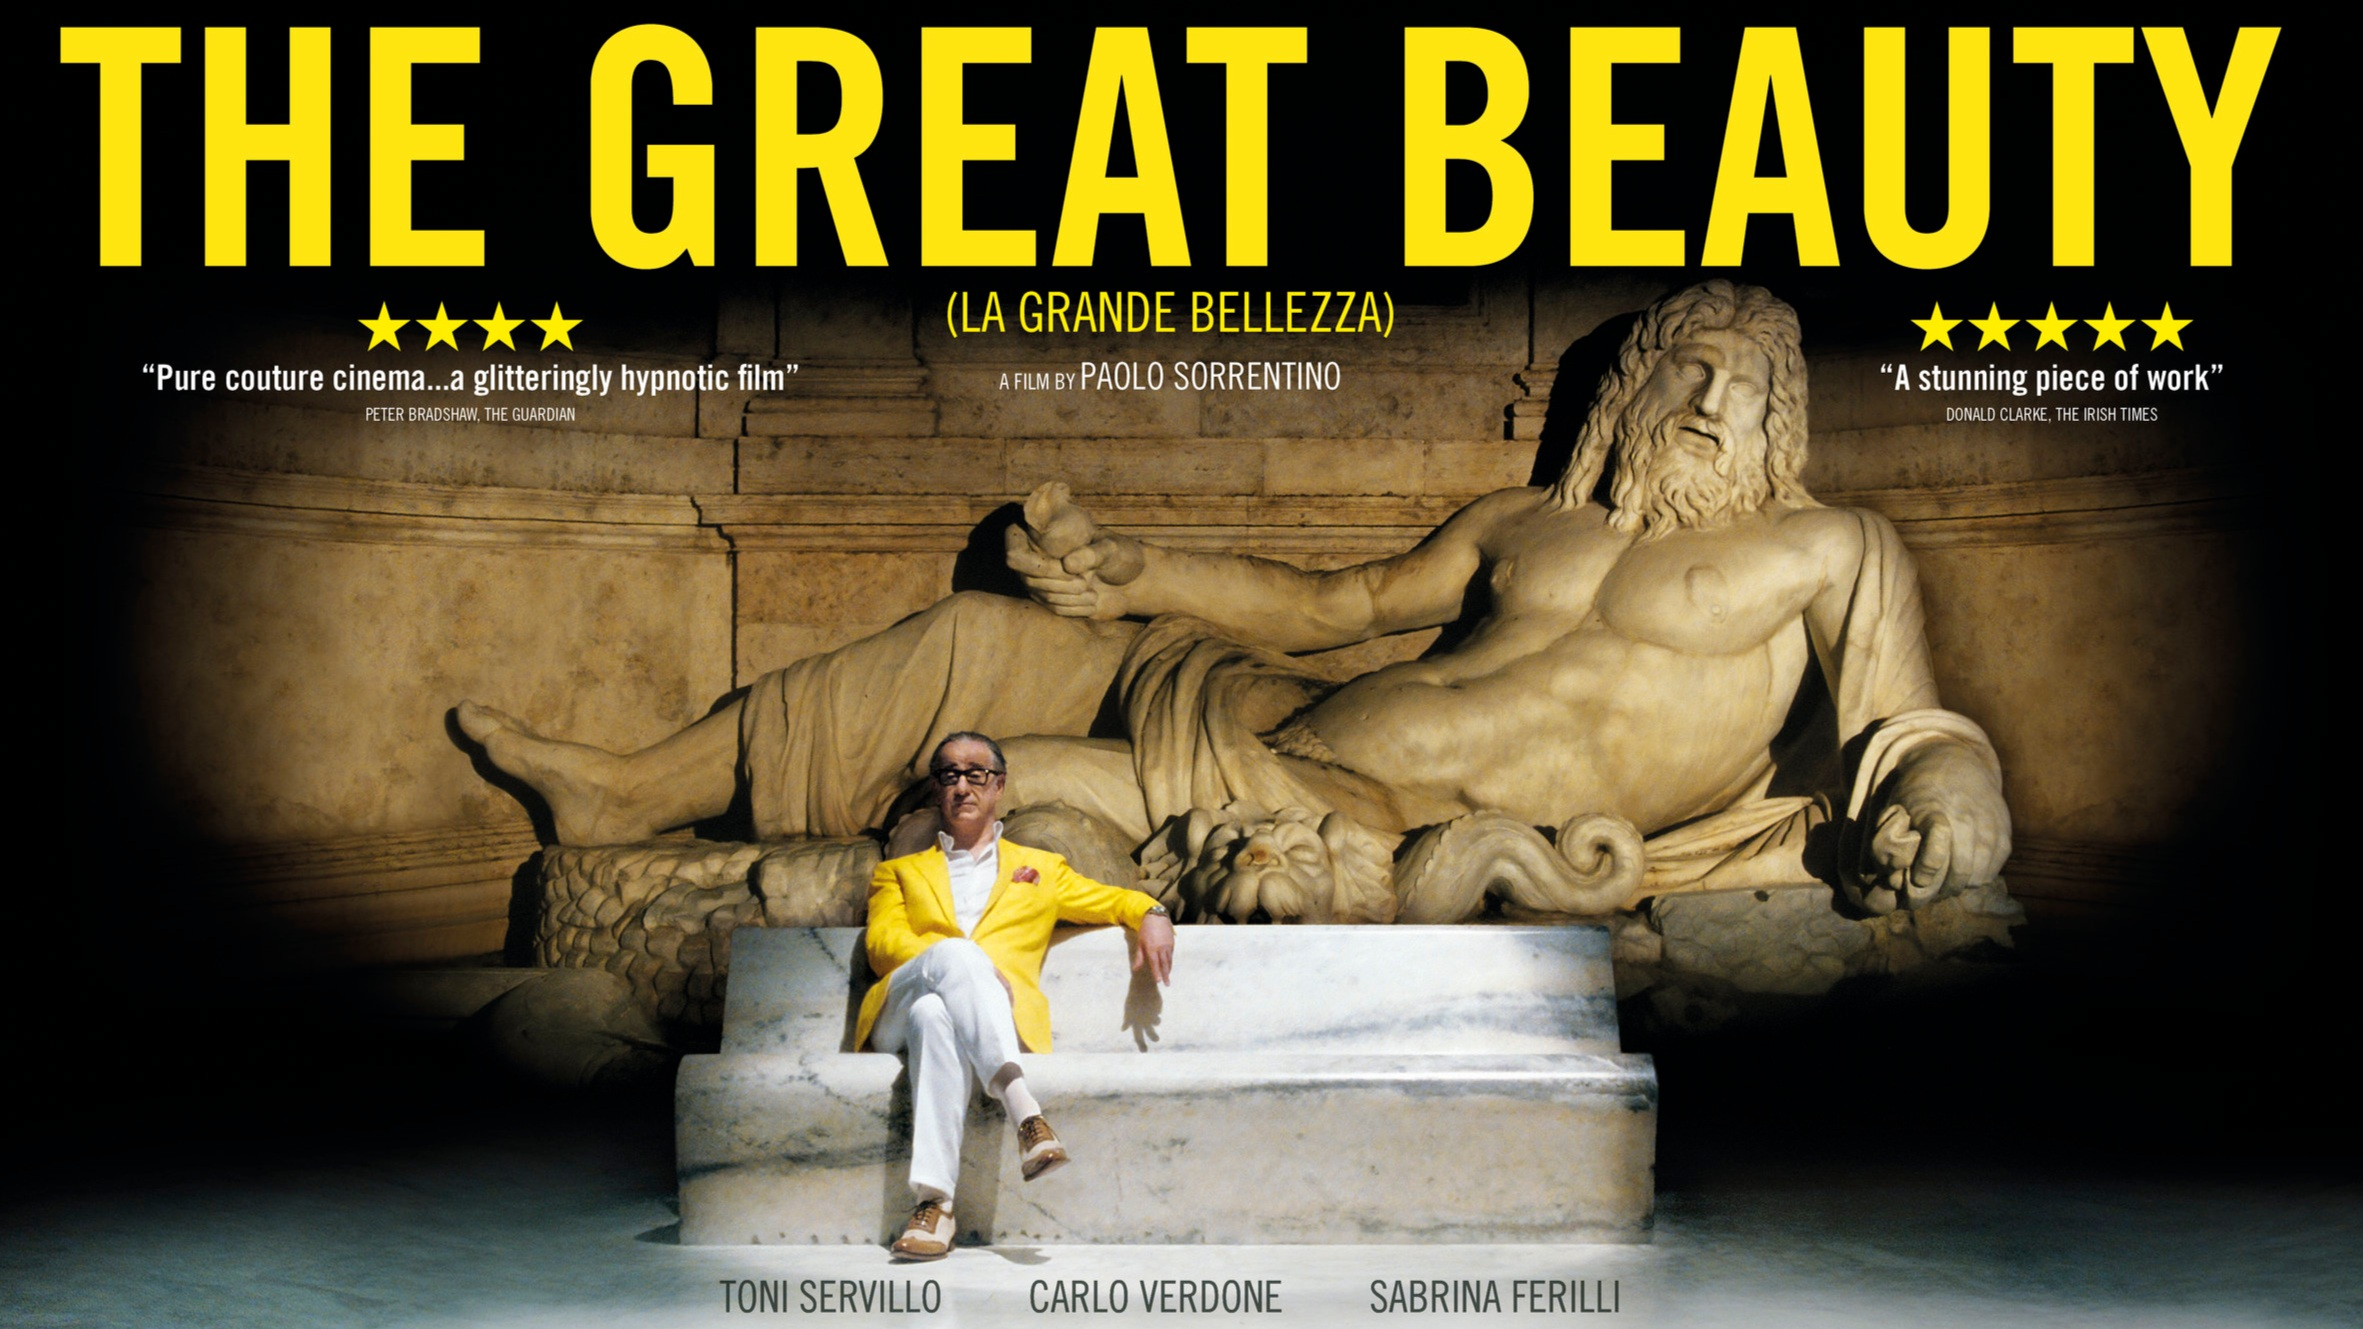 The Great Beauty - Directed by Paolo SorrentinoStarring Toni Servillo, Carlo Verdone, Sabrina Ferilli